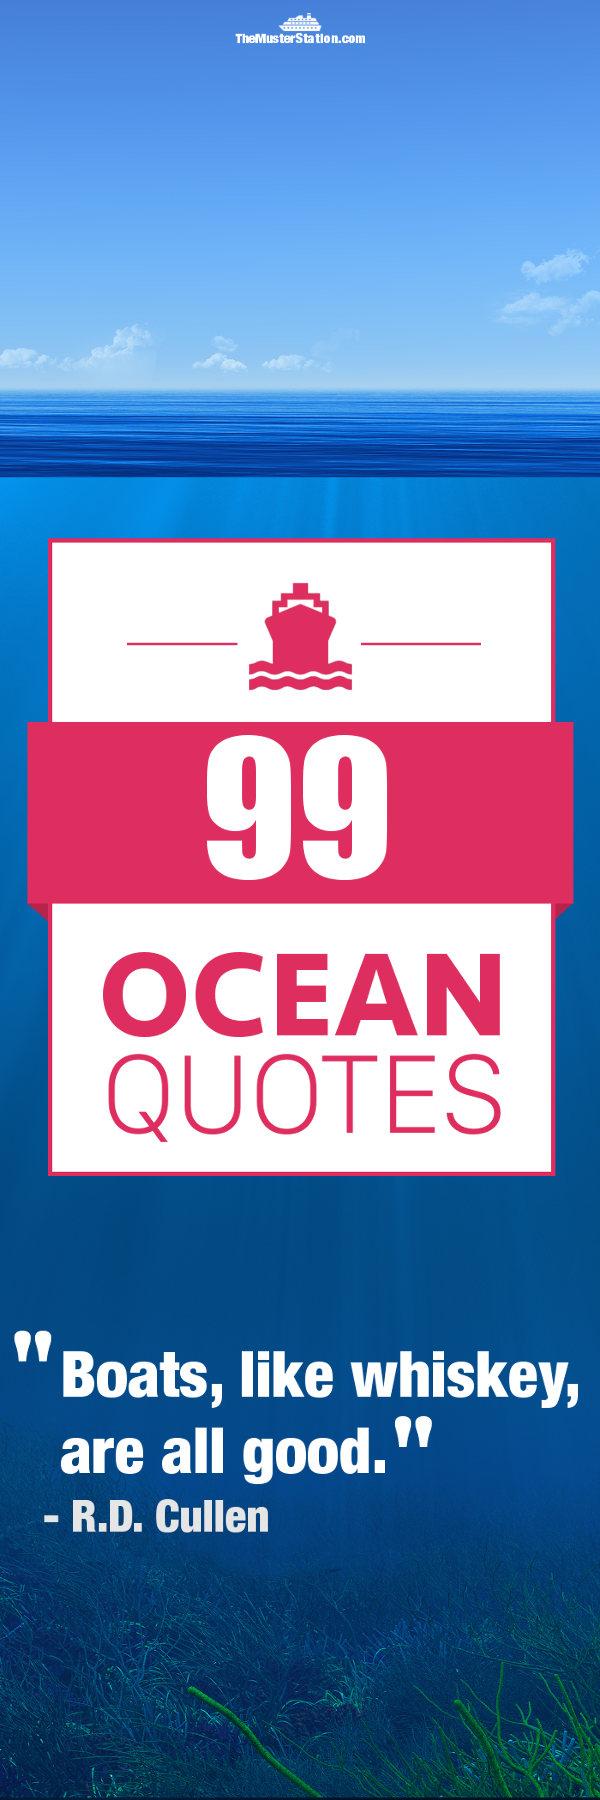 Ocean Quotes Pinterest